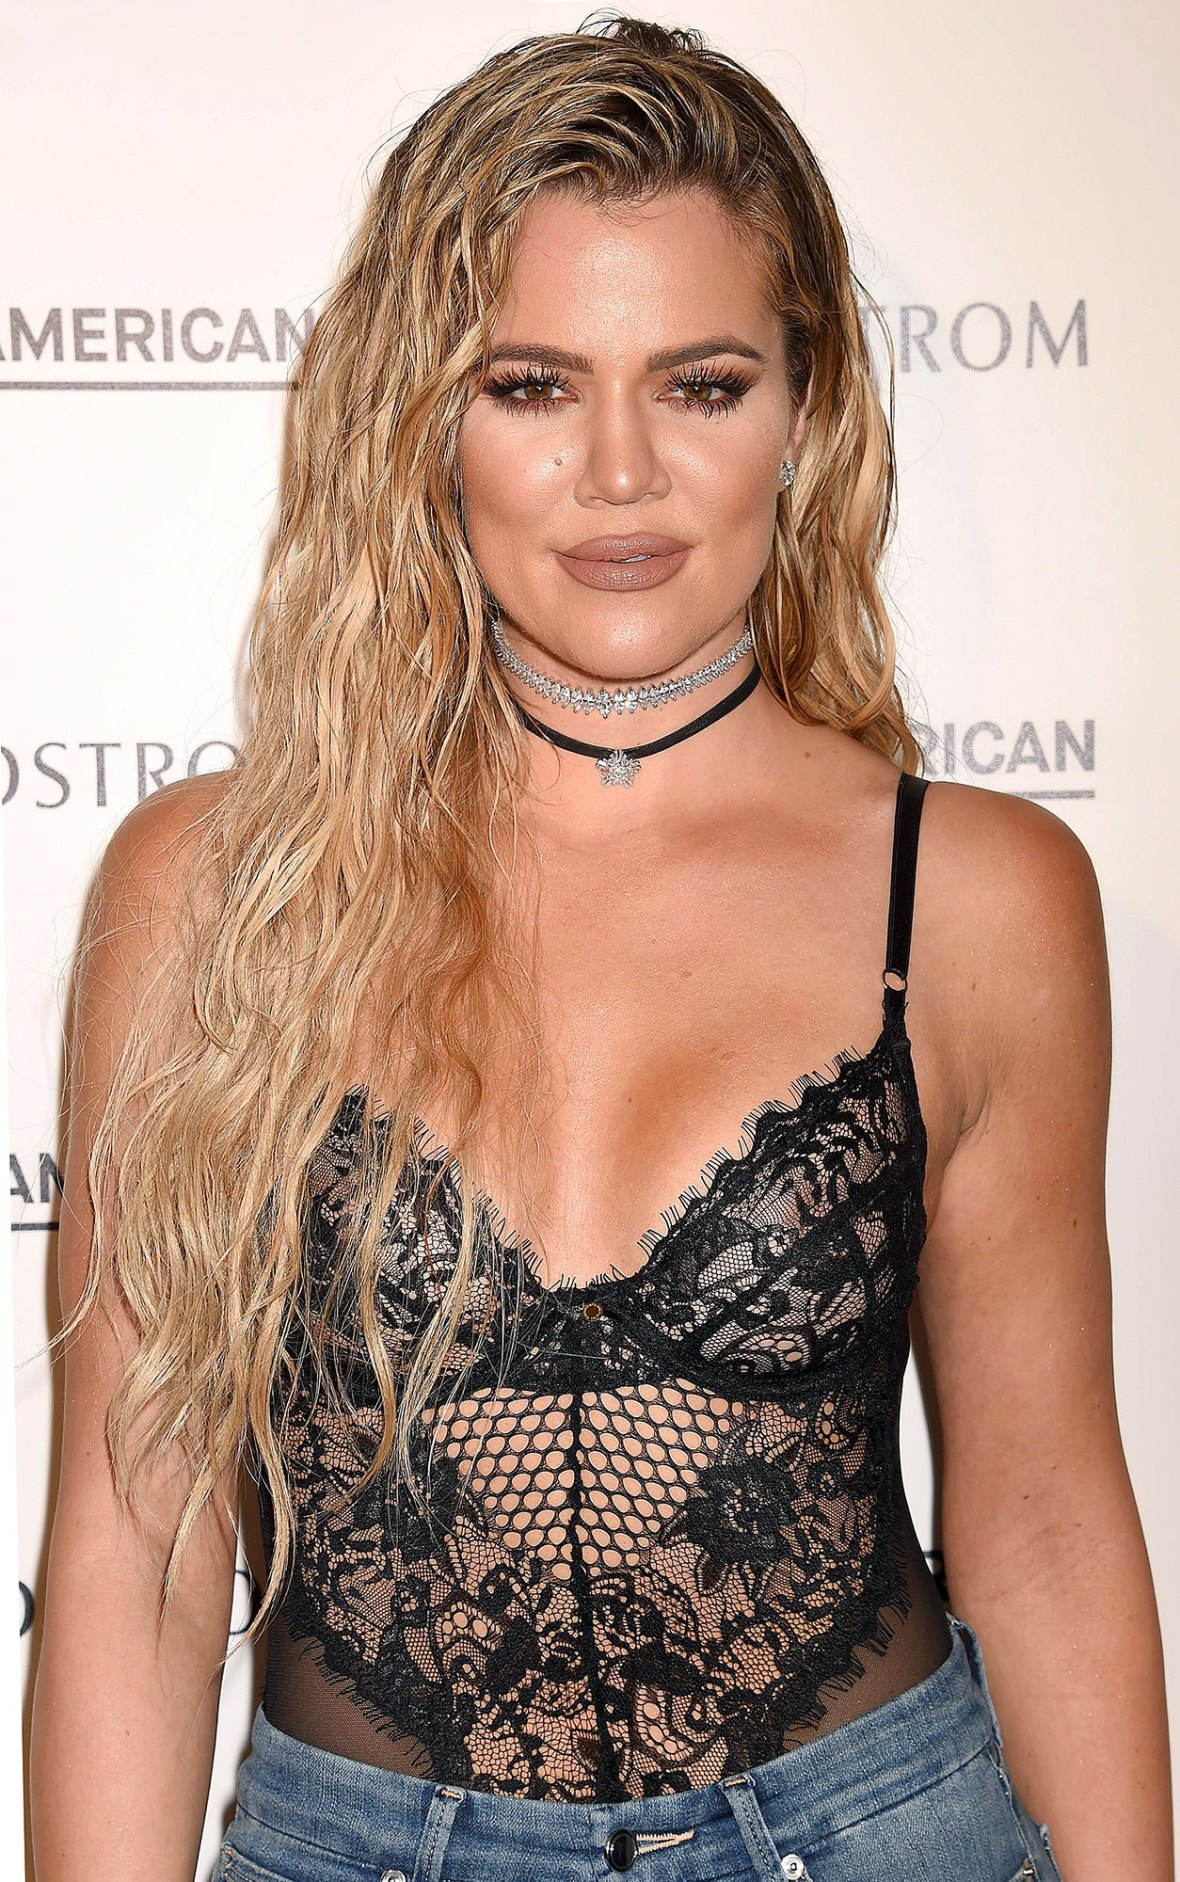 Watch Khloe Kardashian Good American Ad That Is Allegedly Too Racy TV